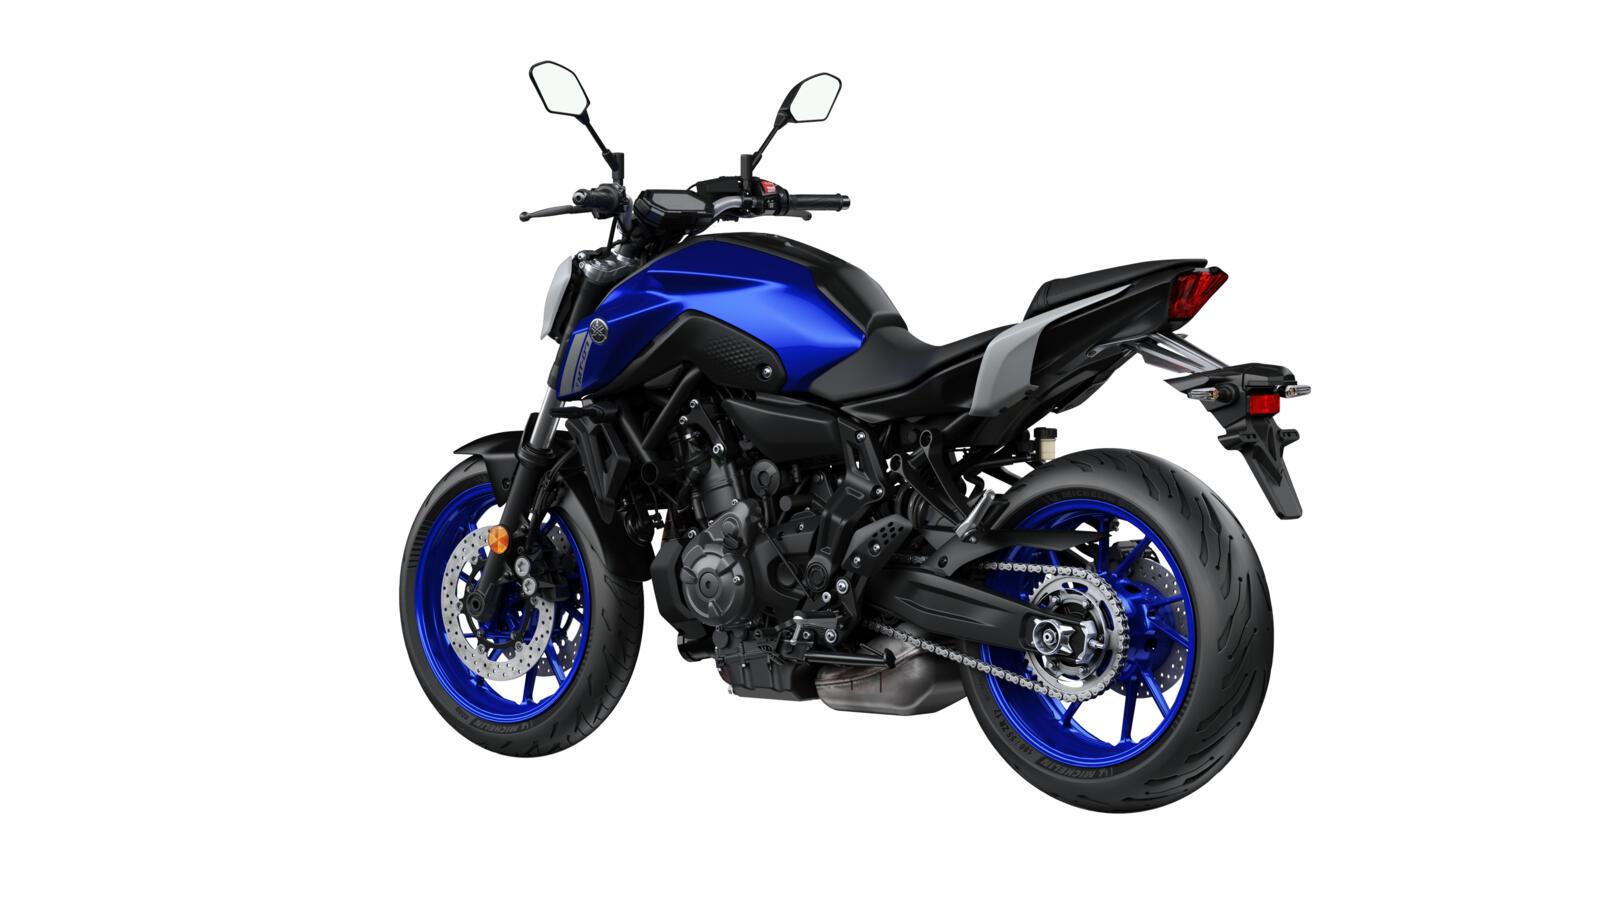 Yamaha-MT-07-my2021-3